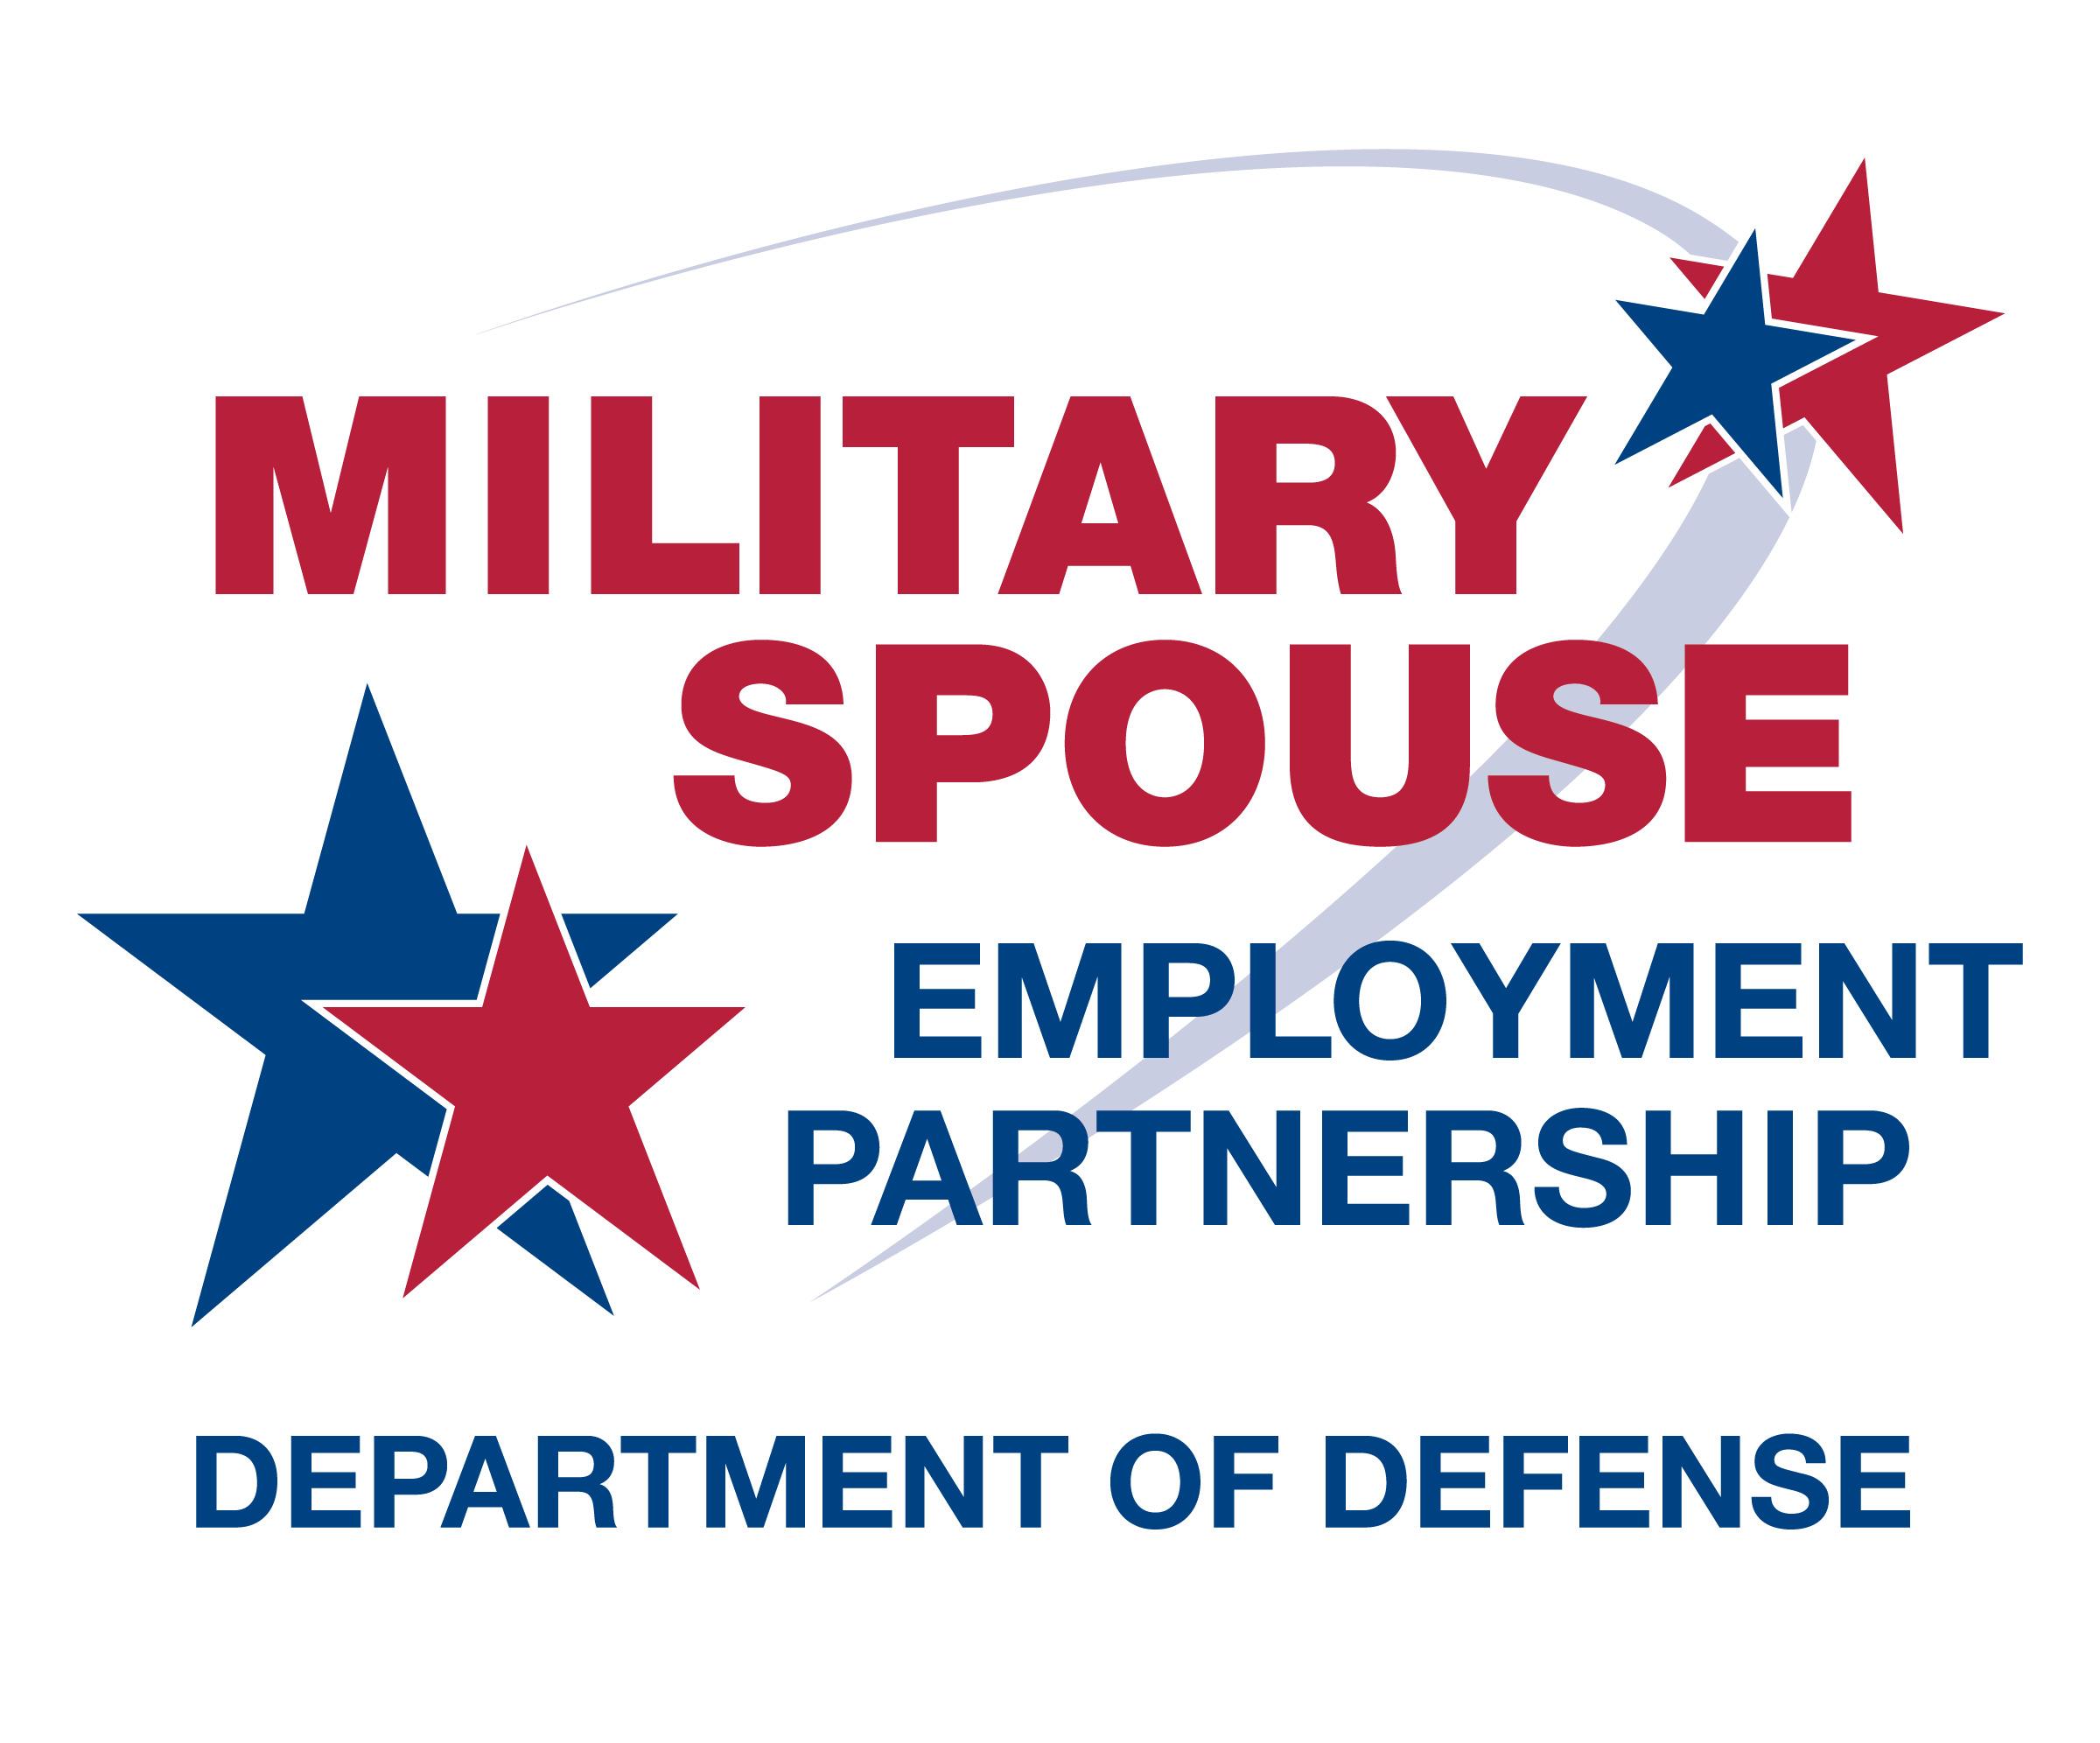 Military Spouse Employment Partnership. Department of Defense